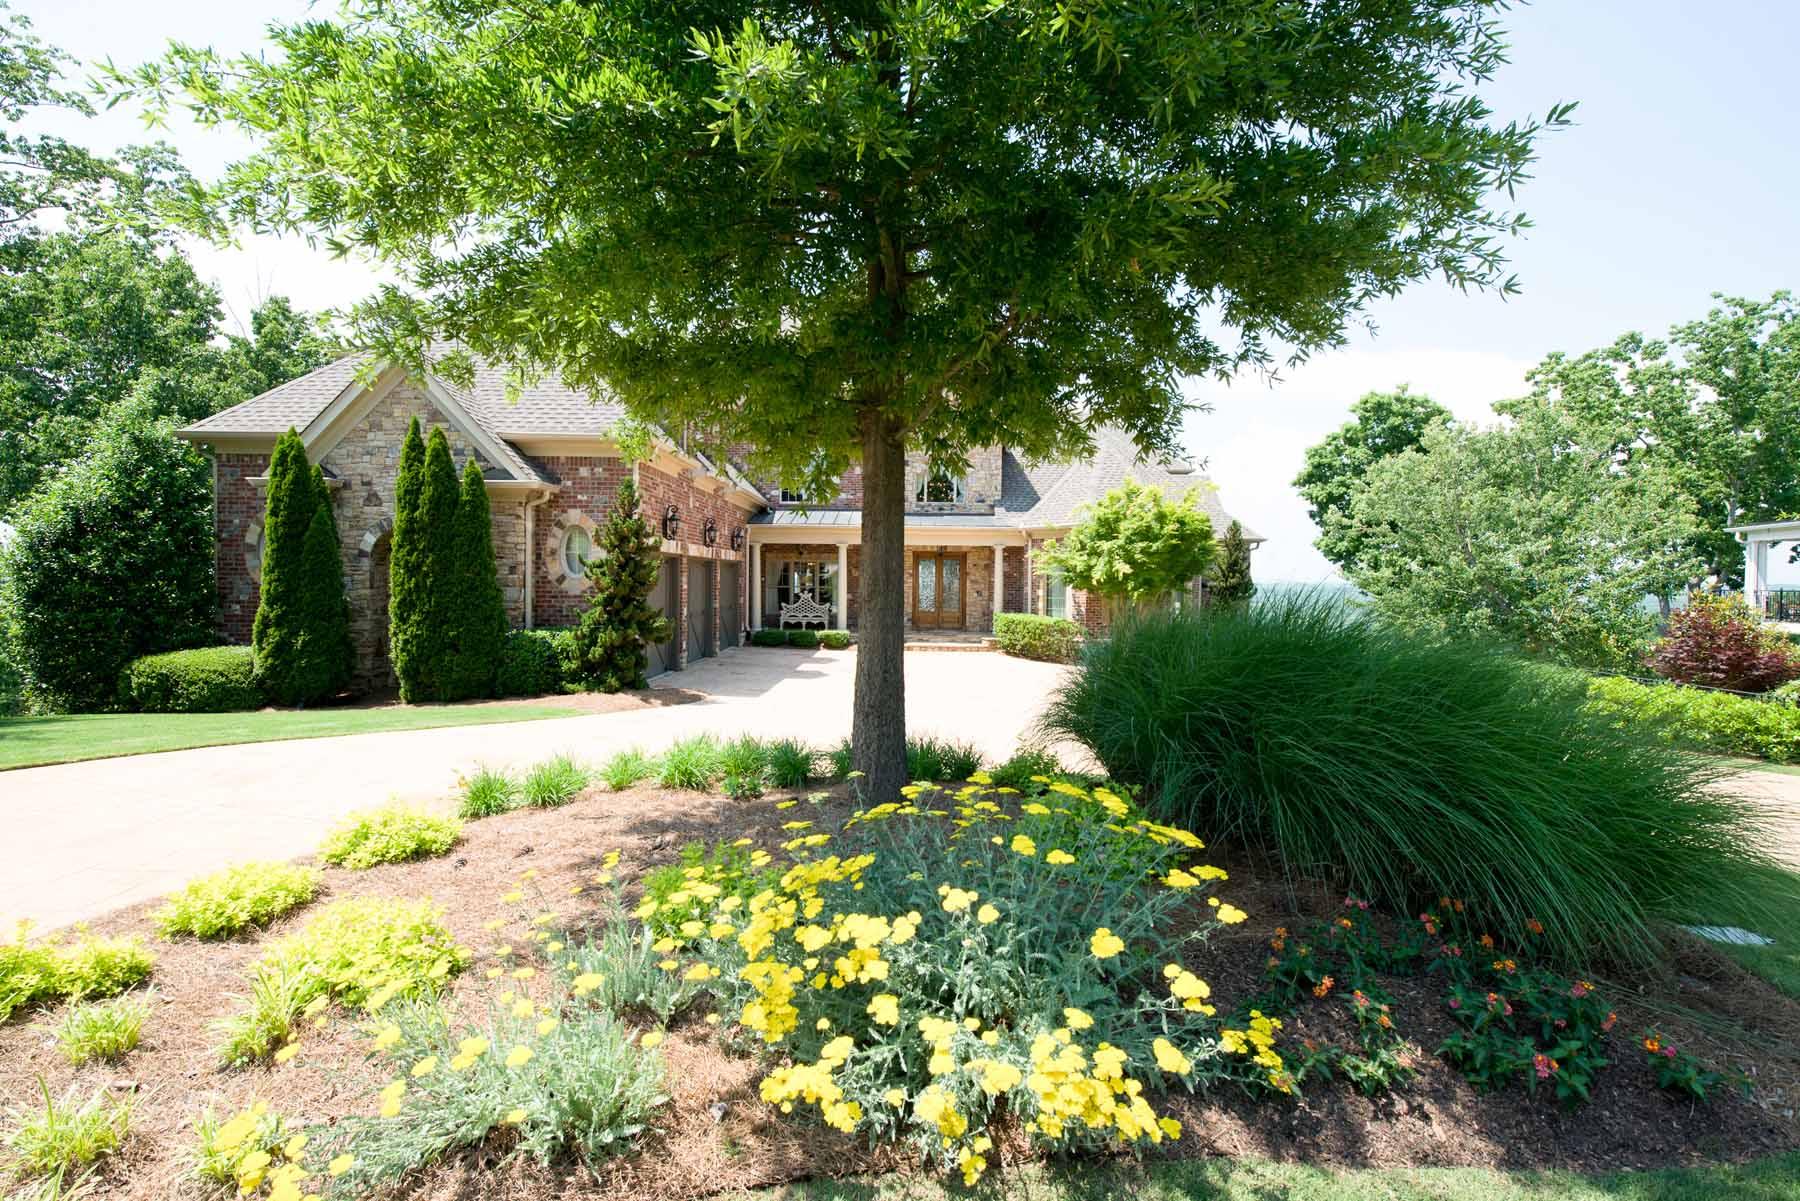 Enfamiljshus för Försäljning vid Exquisite Lake Estate 3620 Lake Ridge Court Gainesville, Georgien 30506 Usa